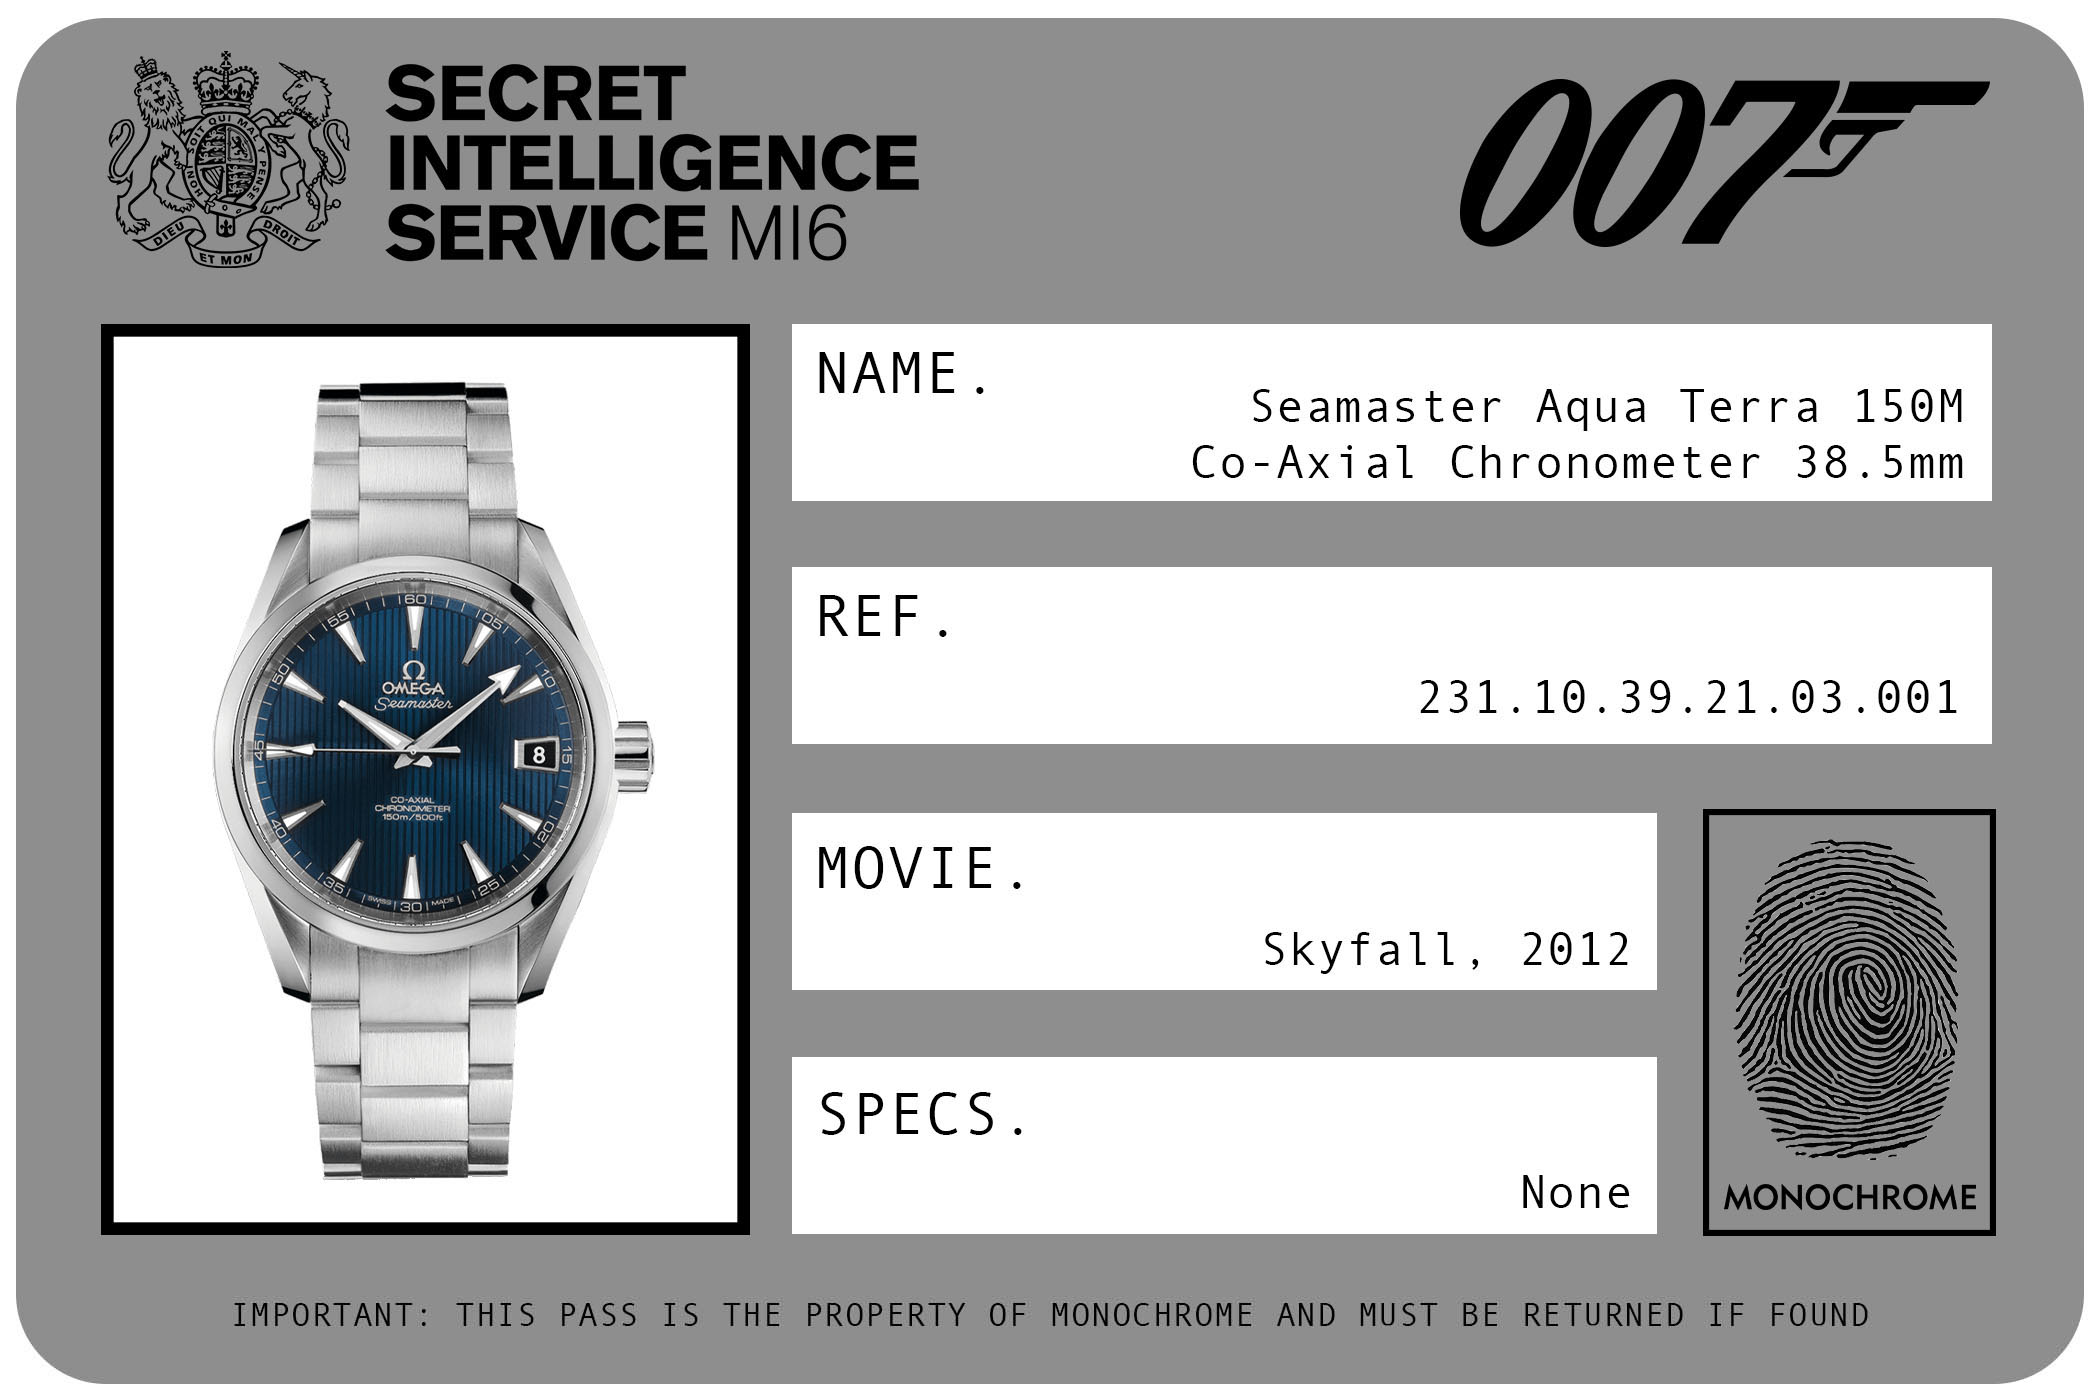 Omega Seamaster Aqua Terra 150M Co-Axial Chronometer 38.5mm 231.10.39.21.03.001 James Bond Skyfall ID Card 2012